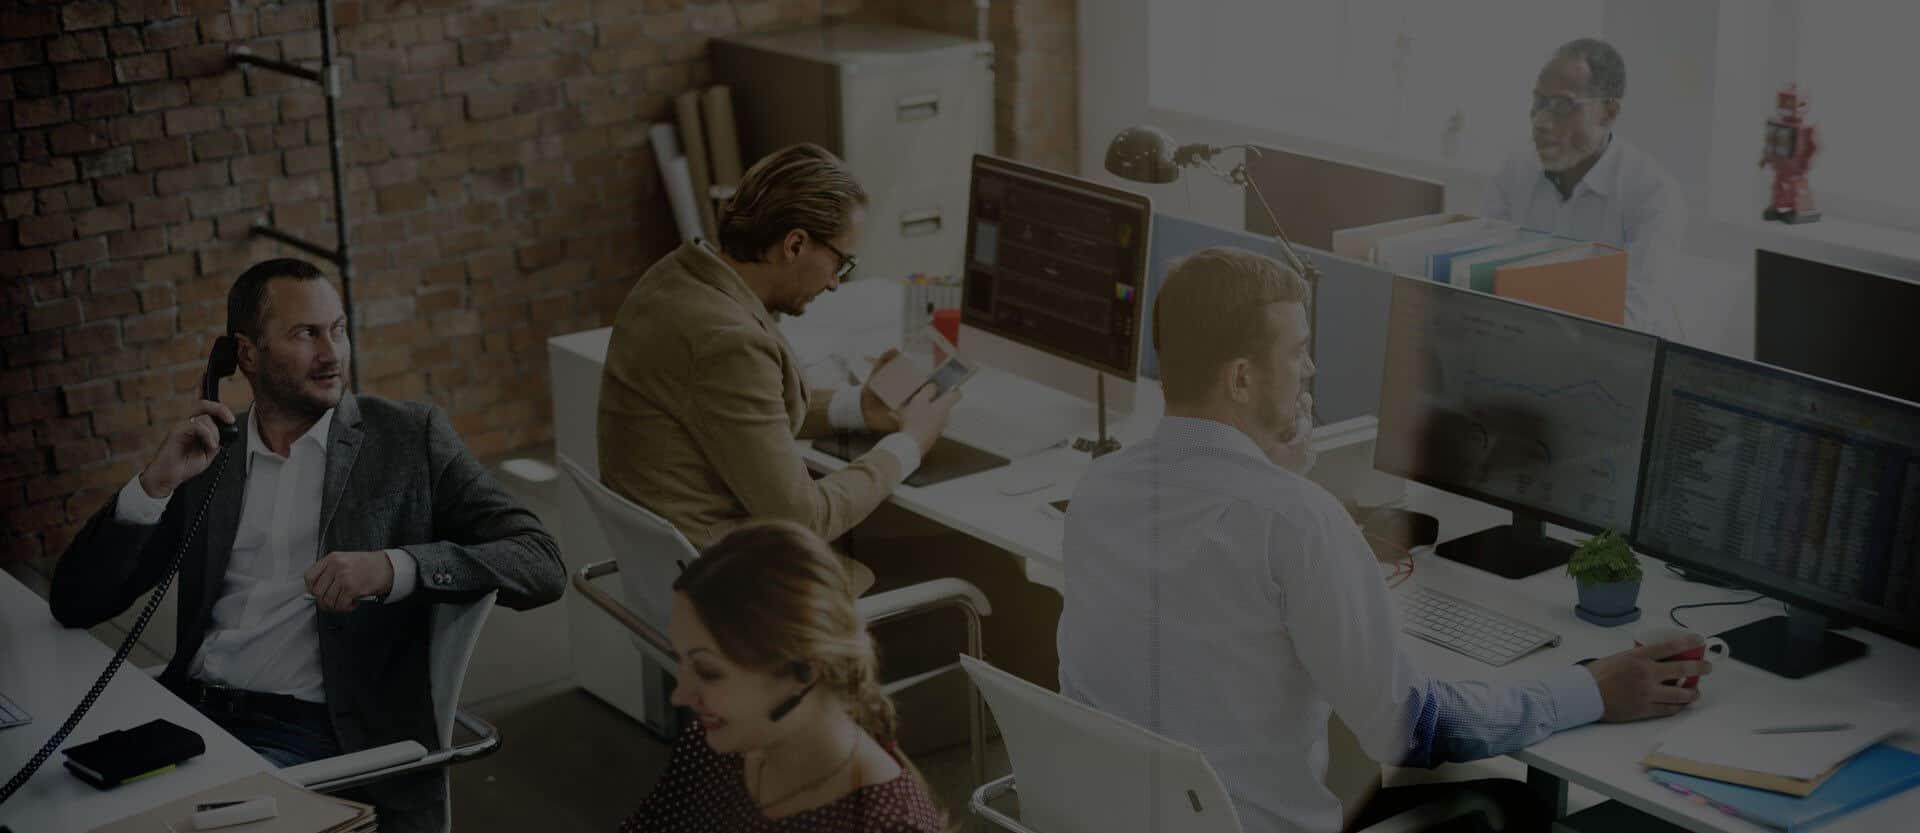 Customer Due Diligence | Behaviour Monitoring Solution